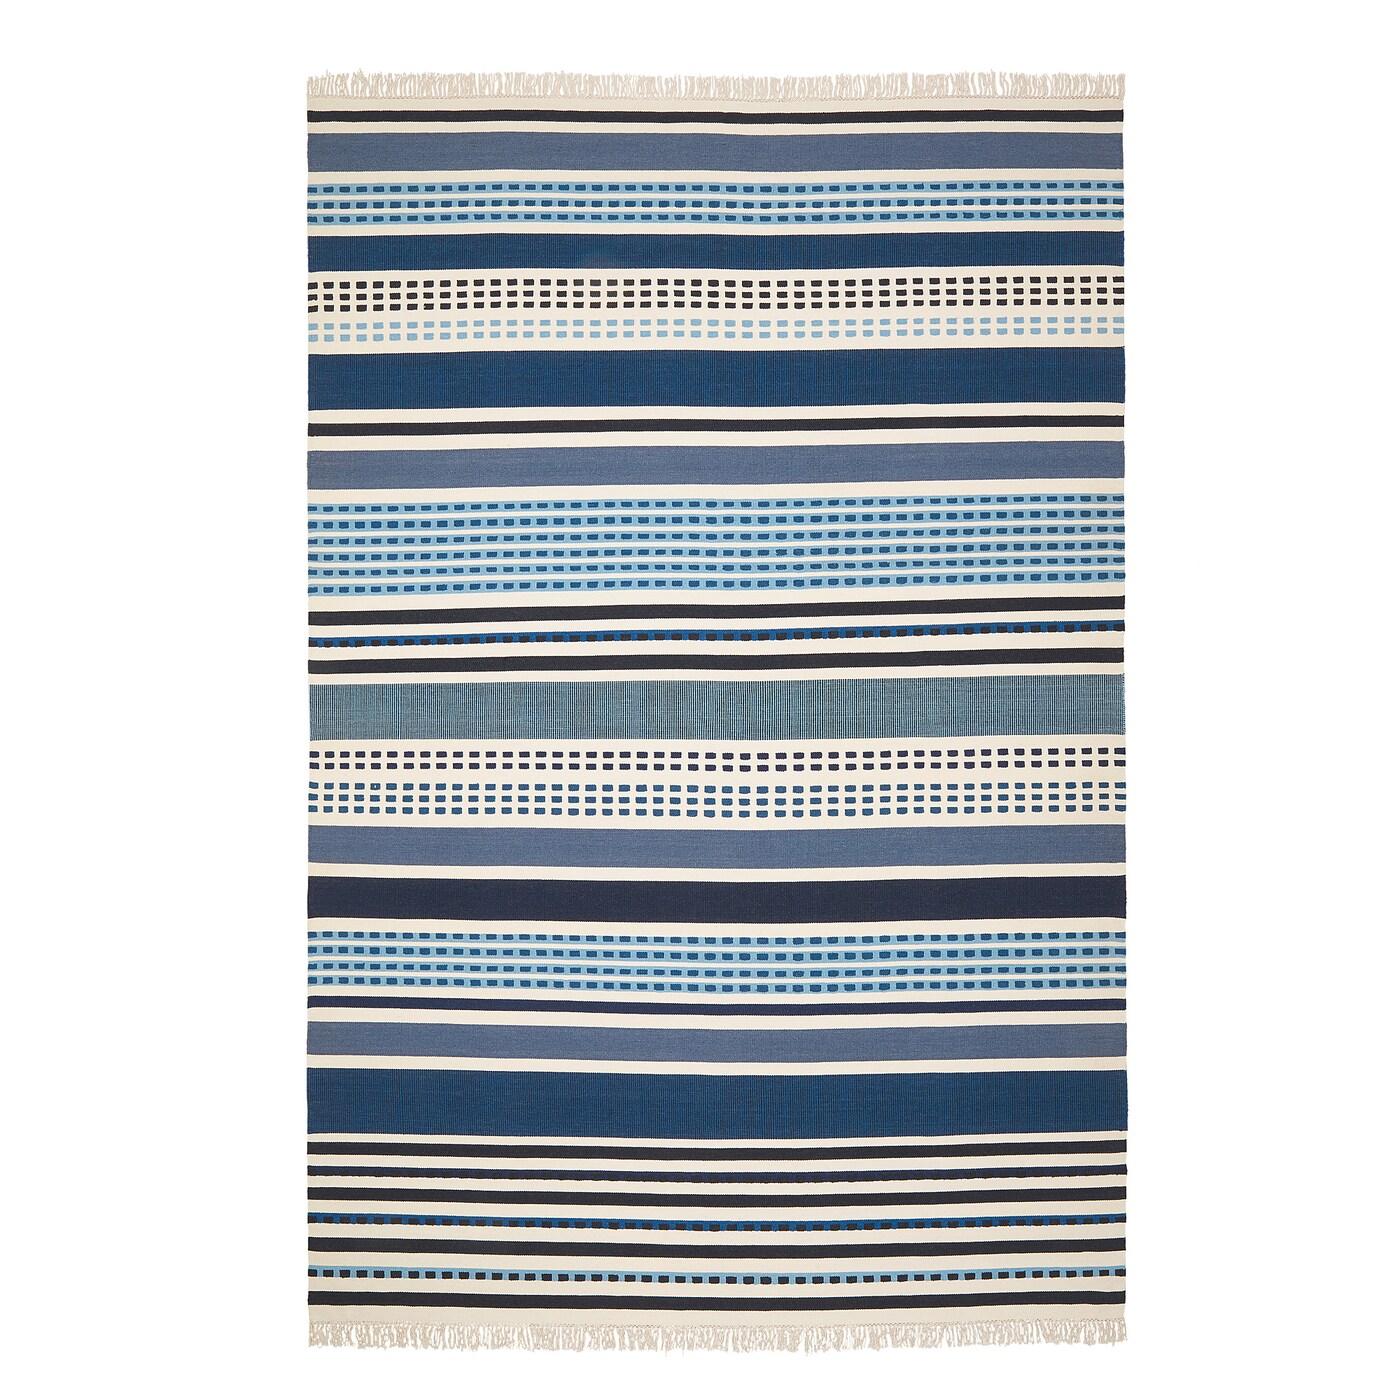 Vonsild Rug Flatwoven Handmade Orted Blue Shades